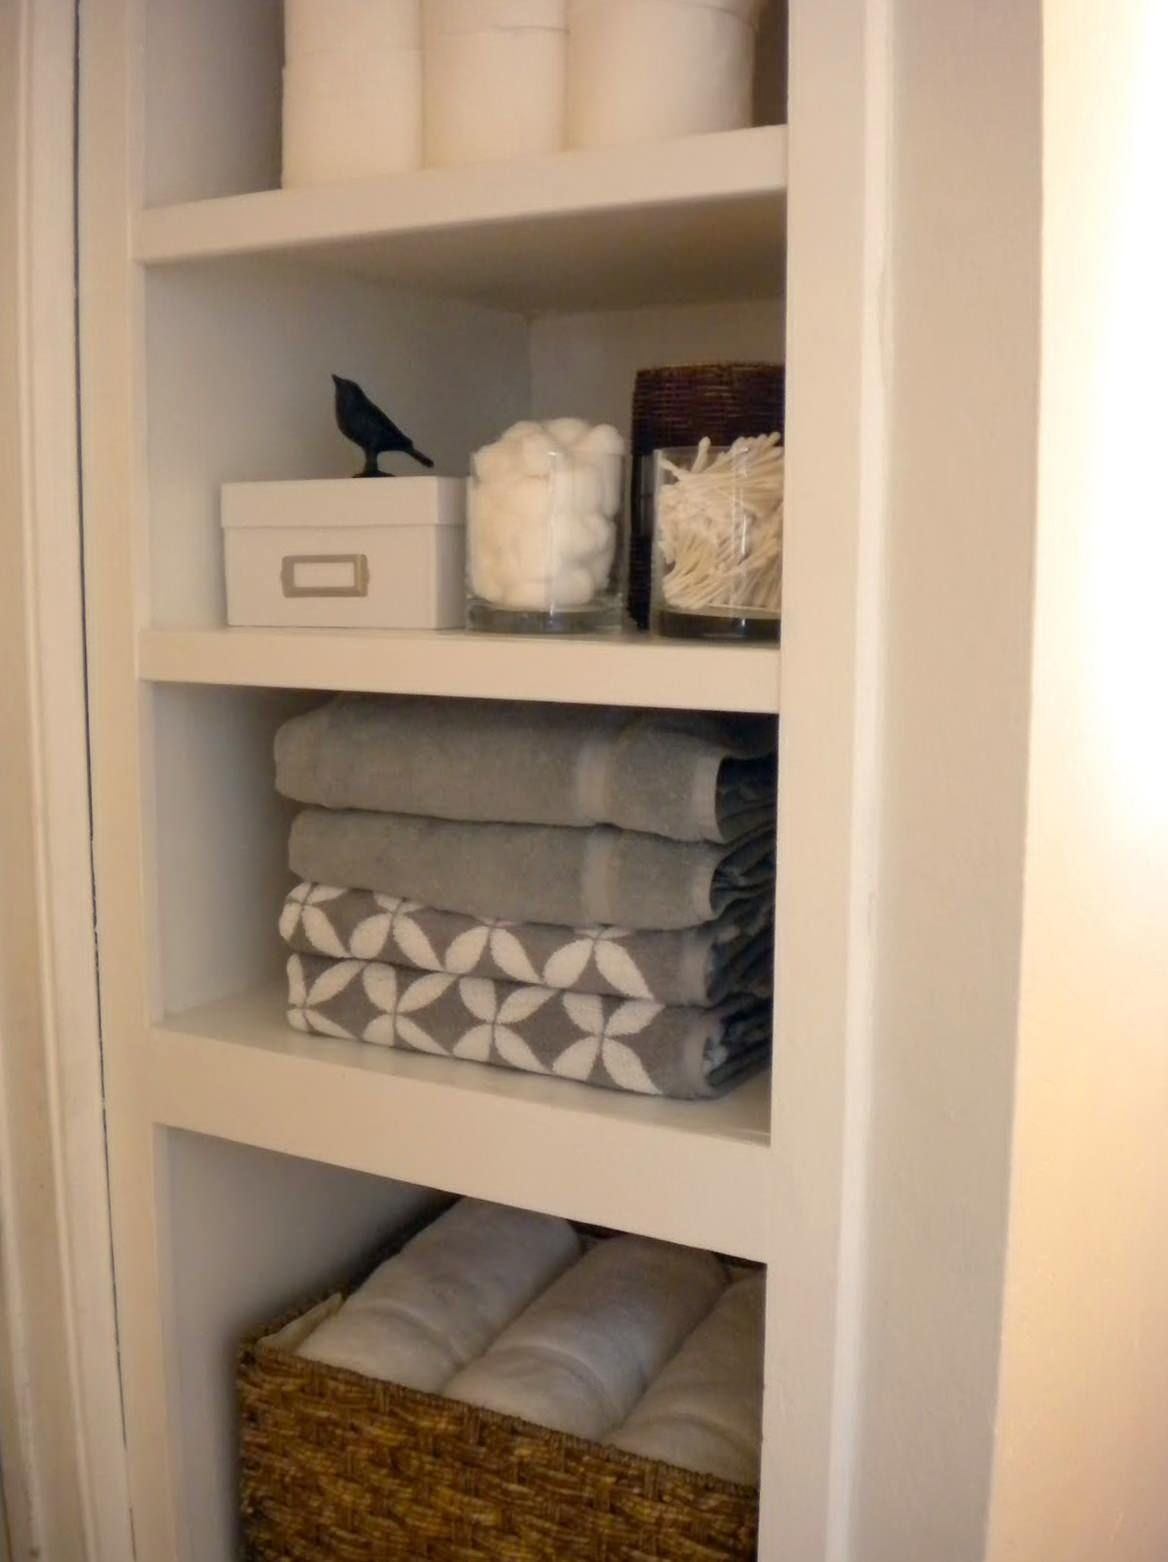 Find Out About Bathroom Shelf Decor Linen Closet Design Slim Bathroom Storage Cabinet Bathroom Shelf Decor [ 1562 x 1168 Pixel ]